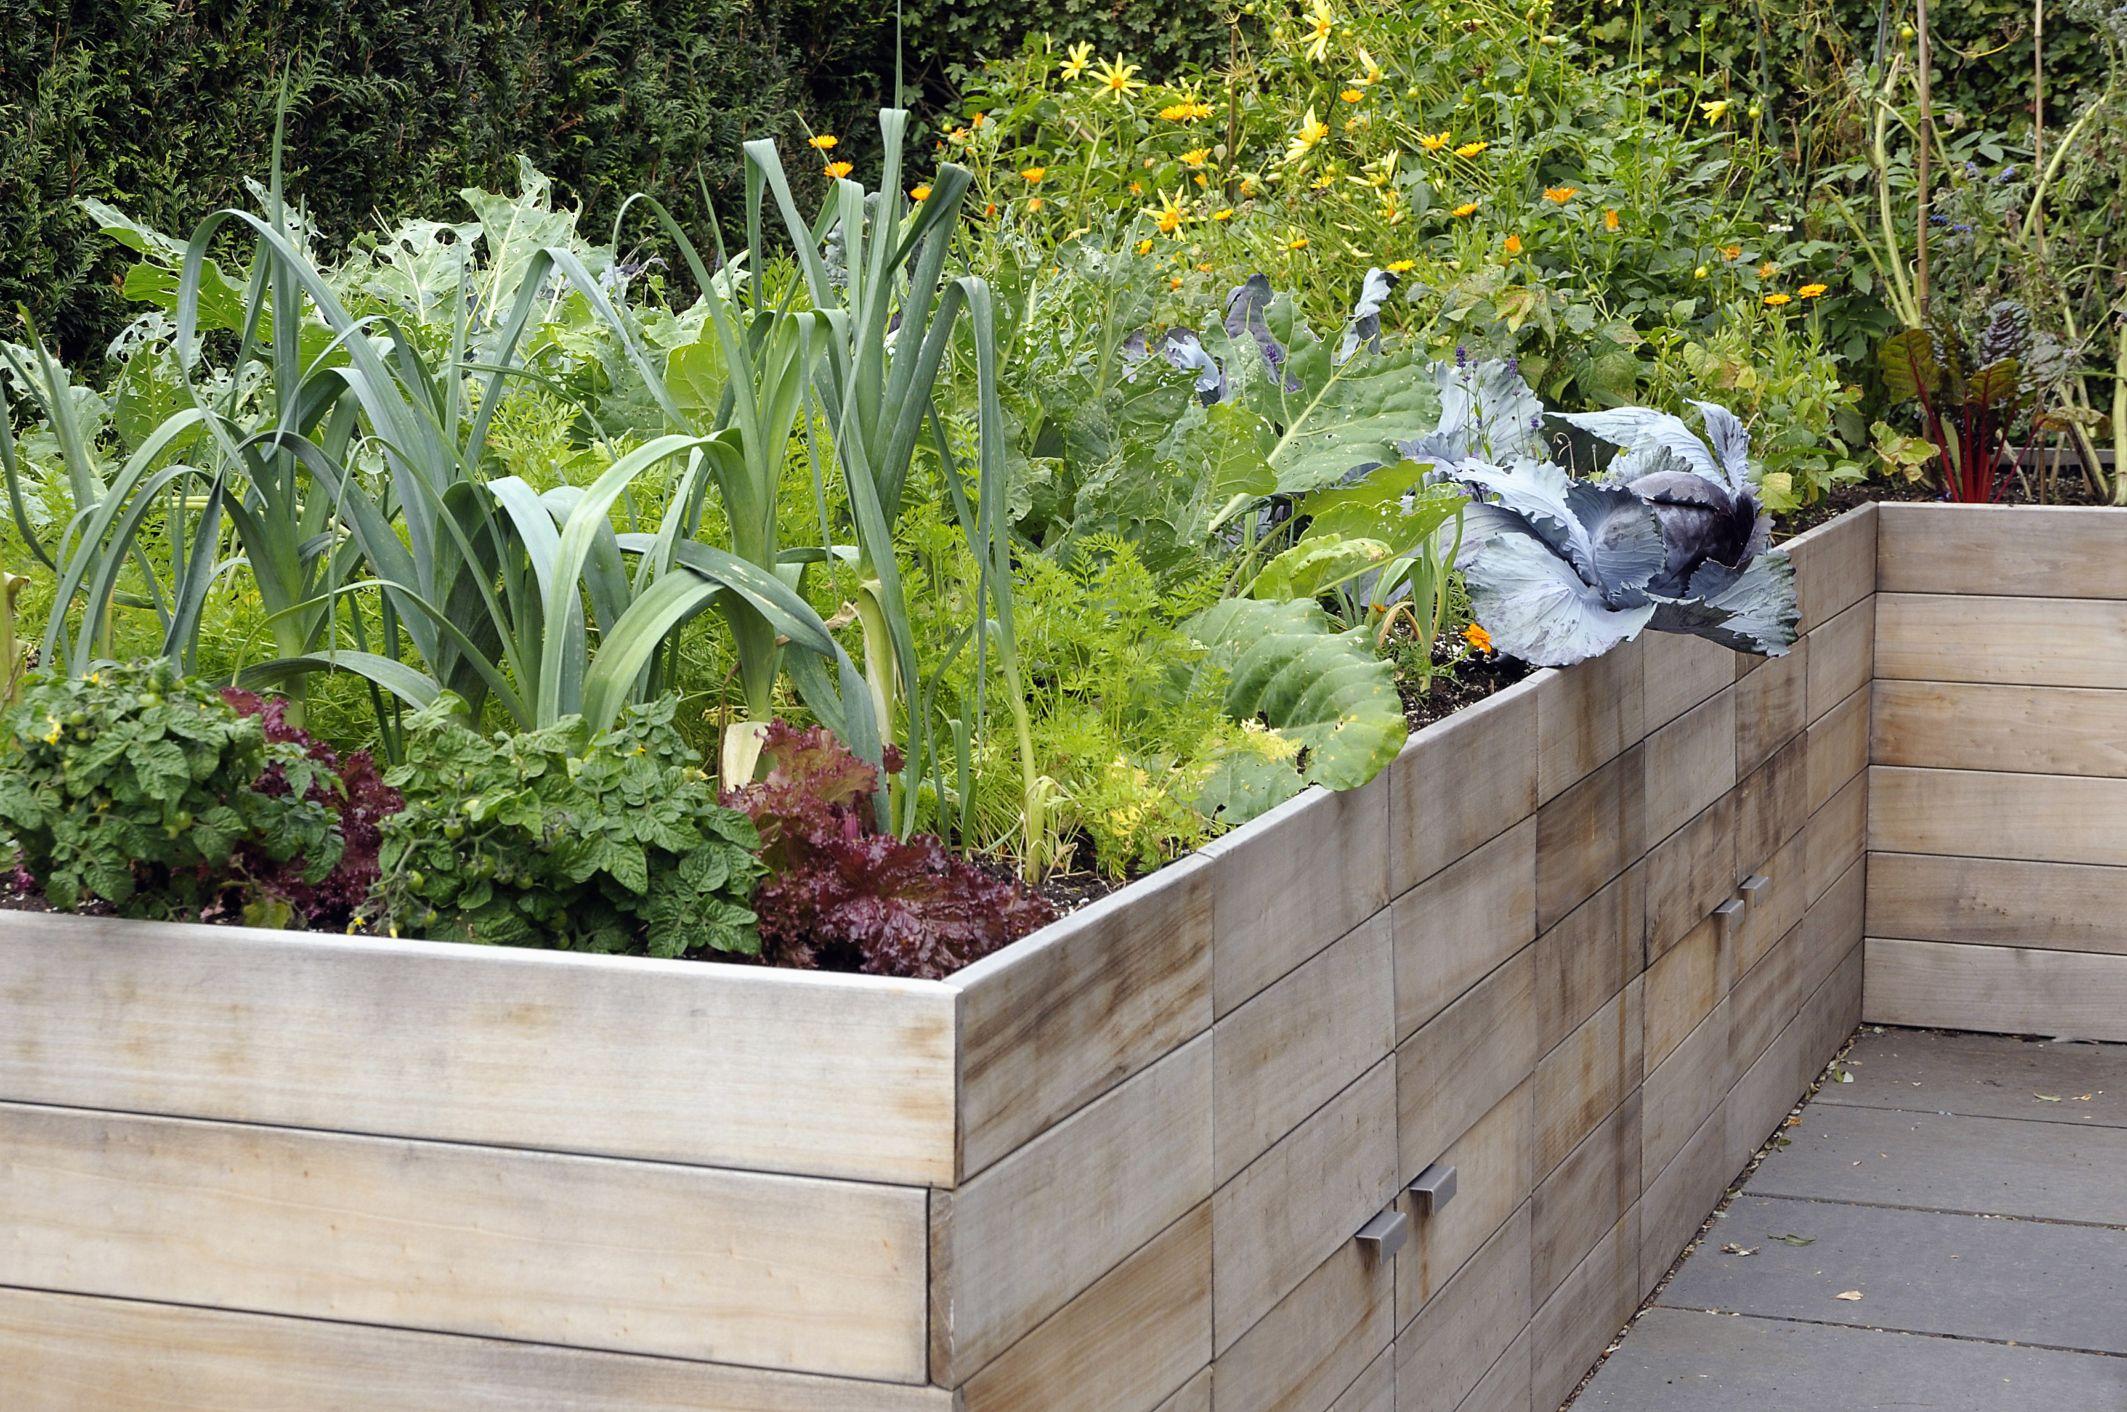 How to Build a Raised Garden Bed - DIY Container Garden